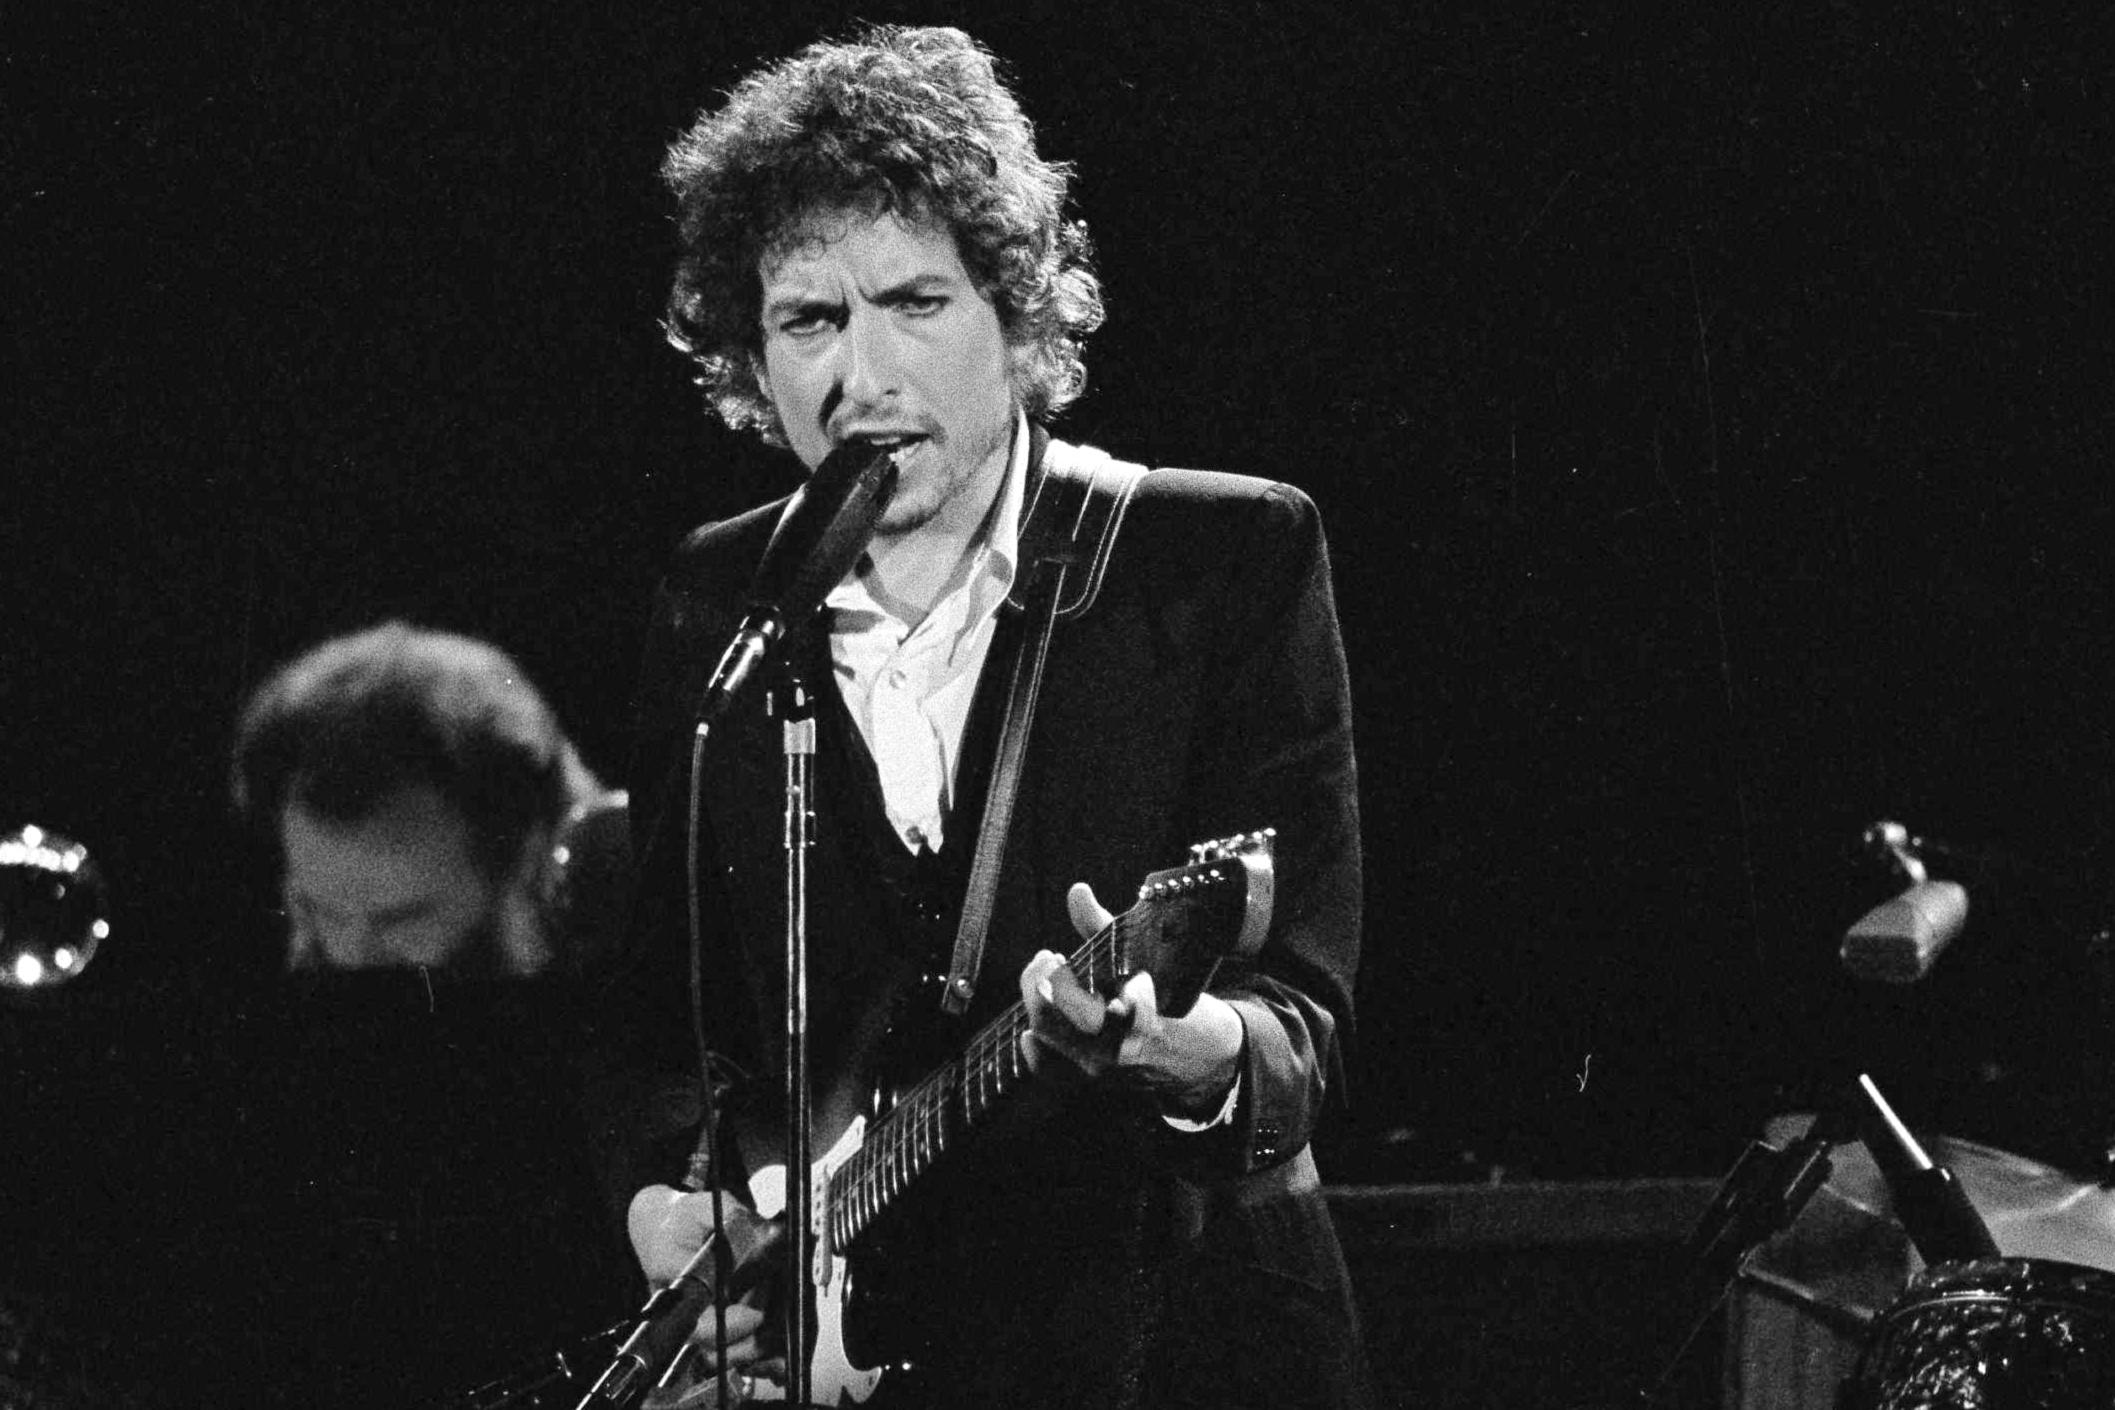 Bob Dylan, Robert Zimmerman, Robbie Robertson, Garth Hudson